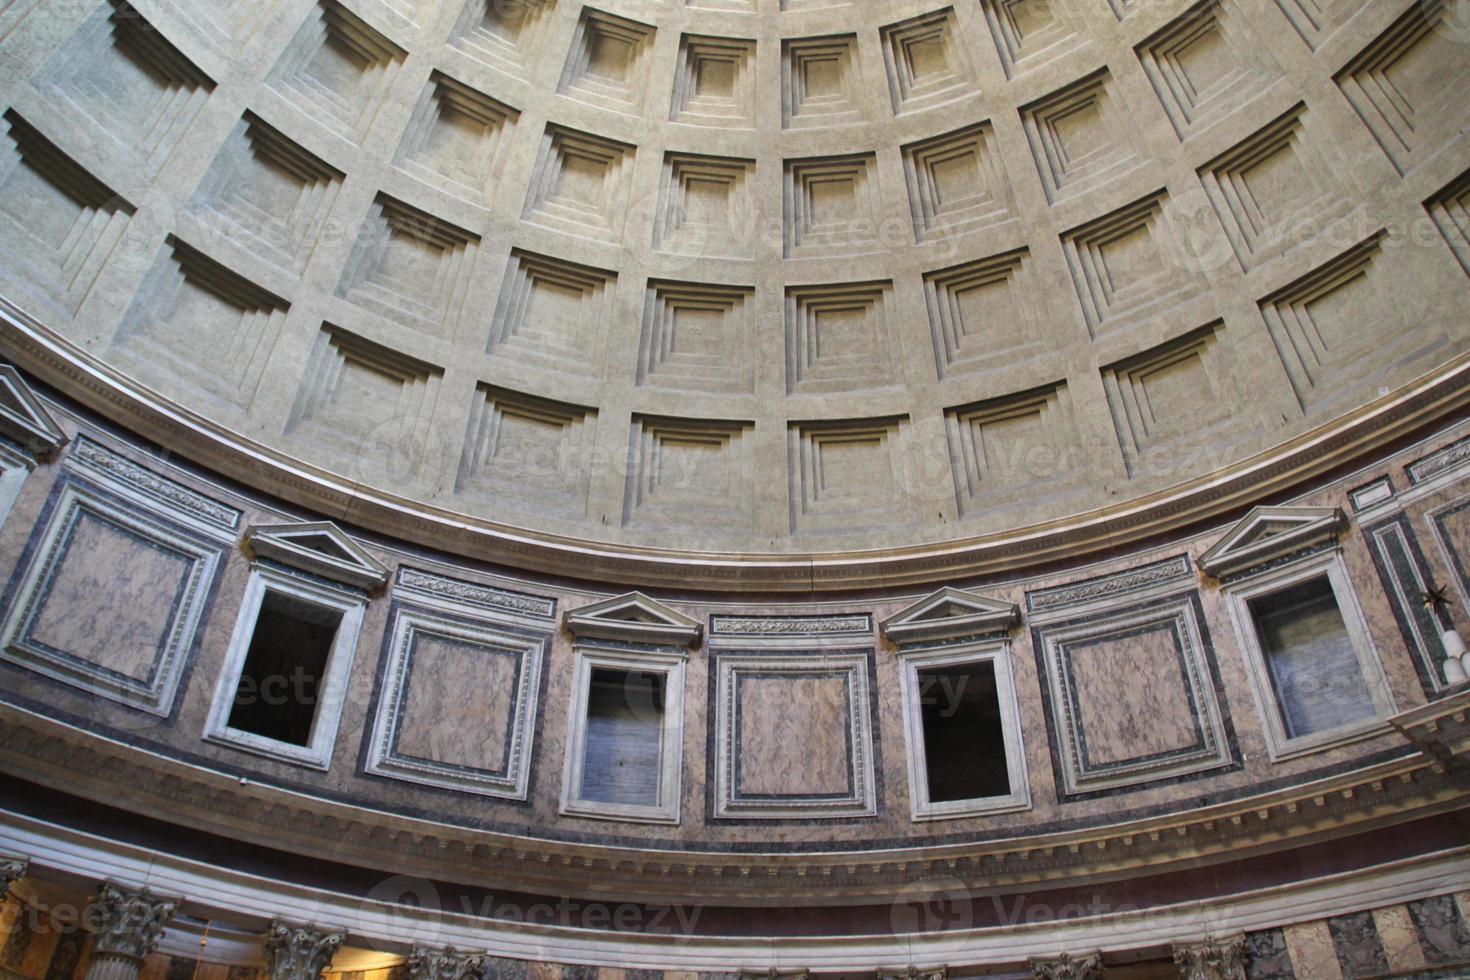 pantheon oculus a roma, italia. foto